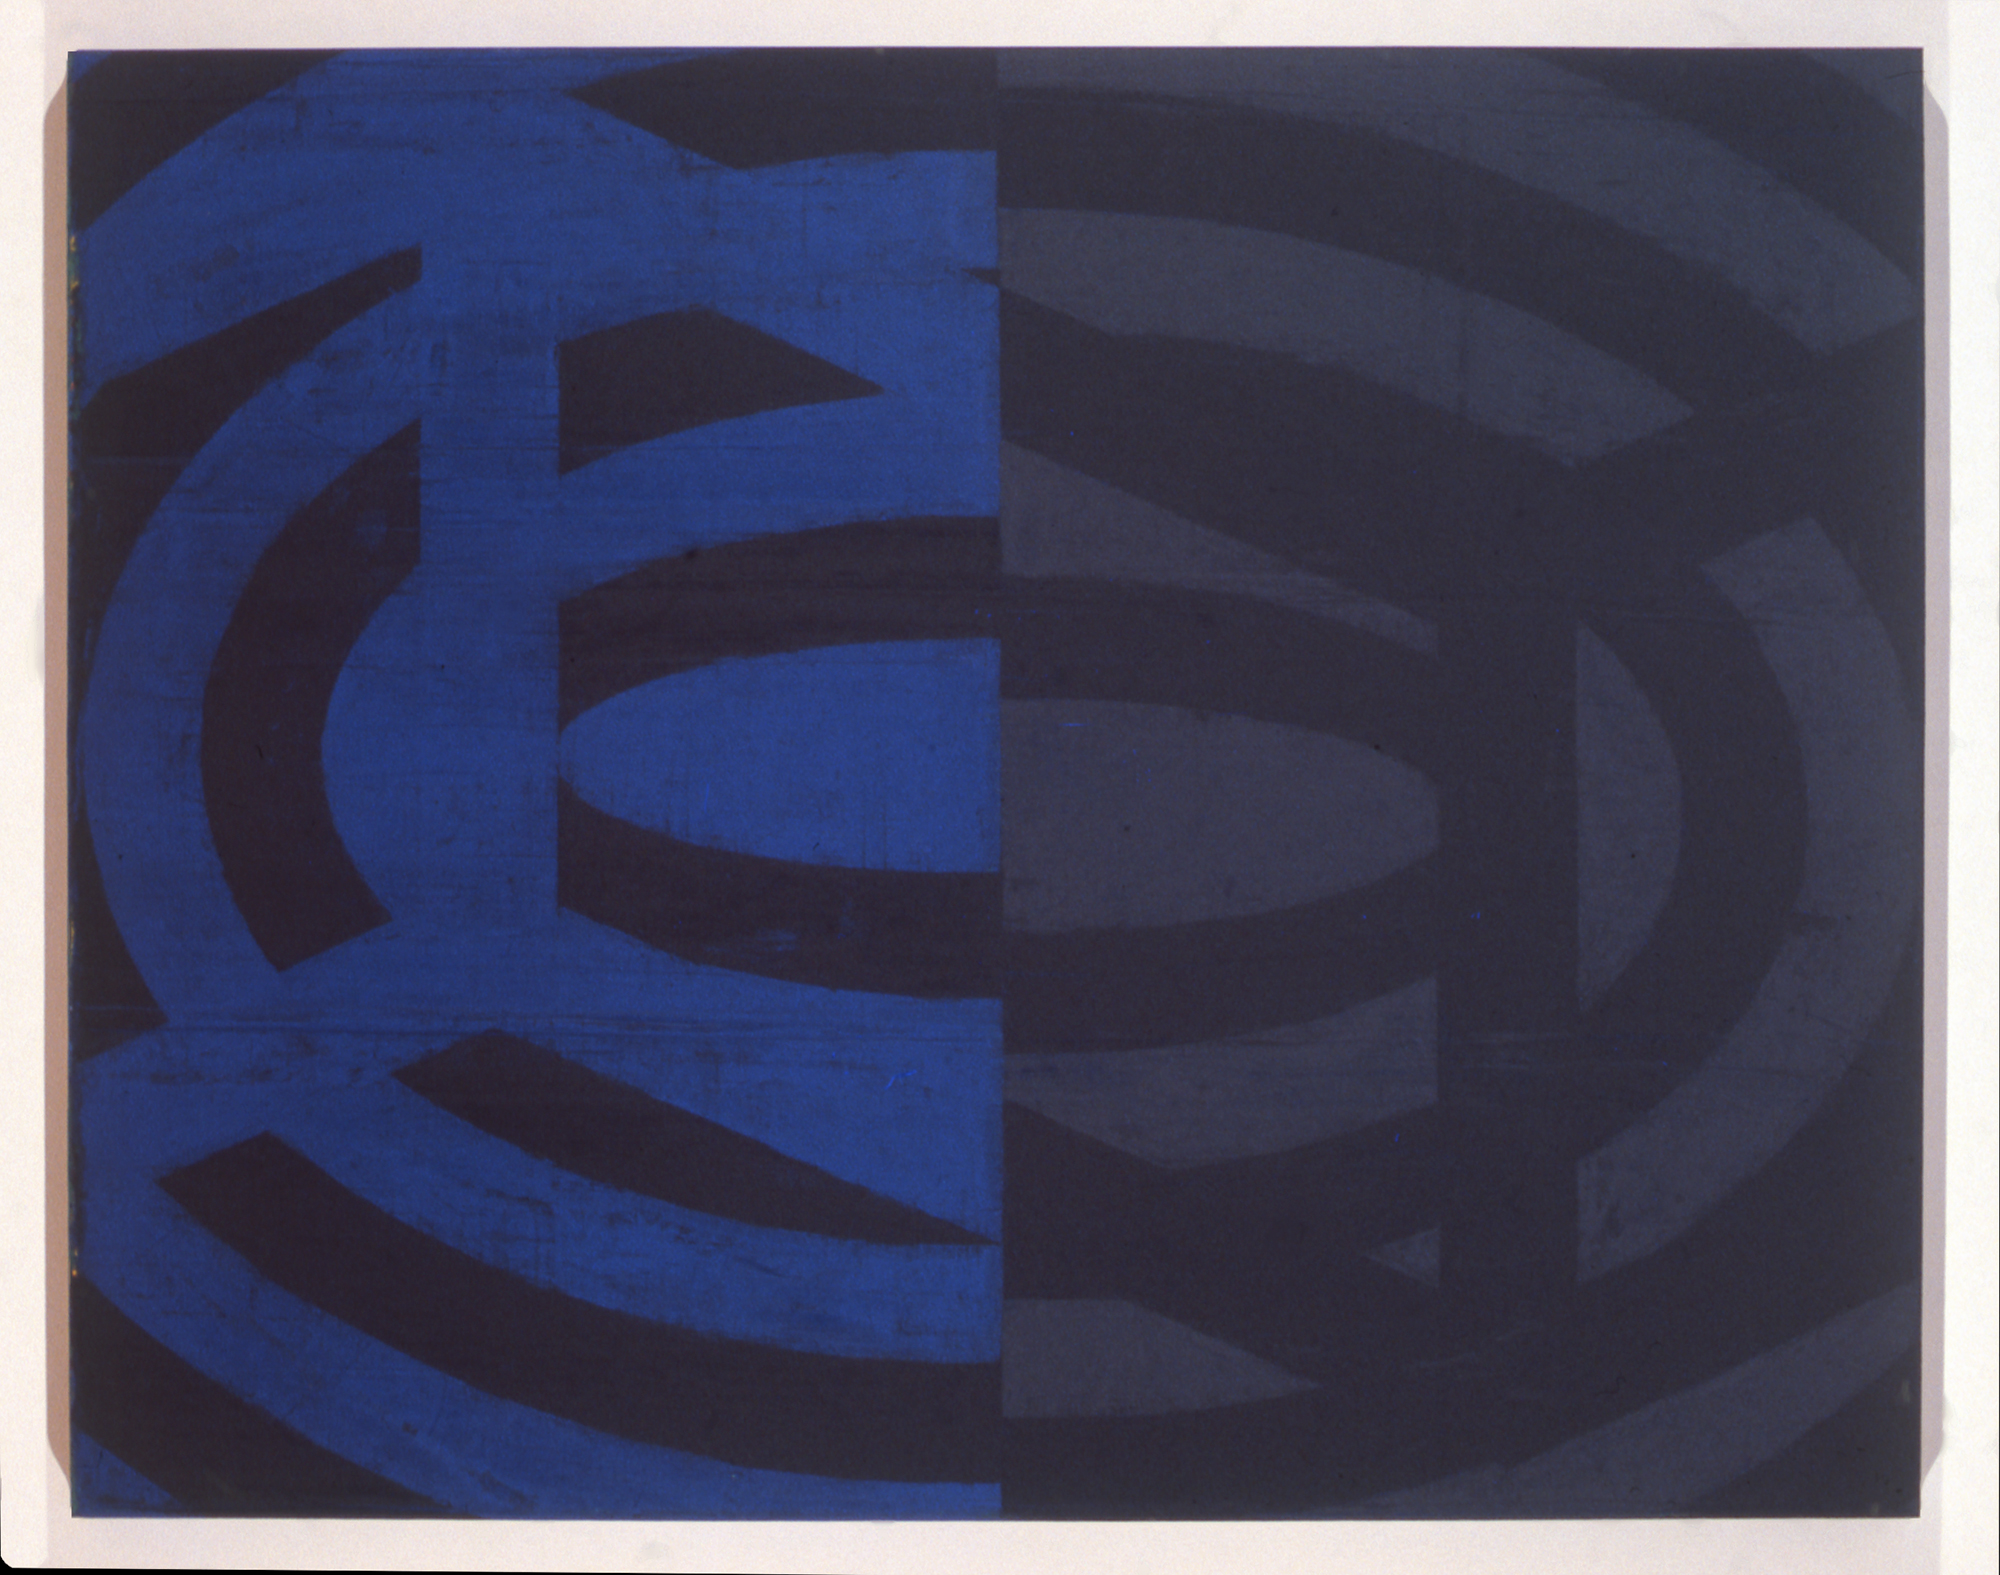 David Row - Cipher